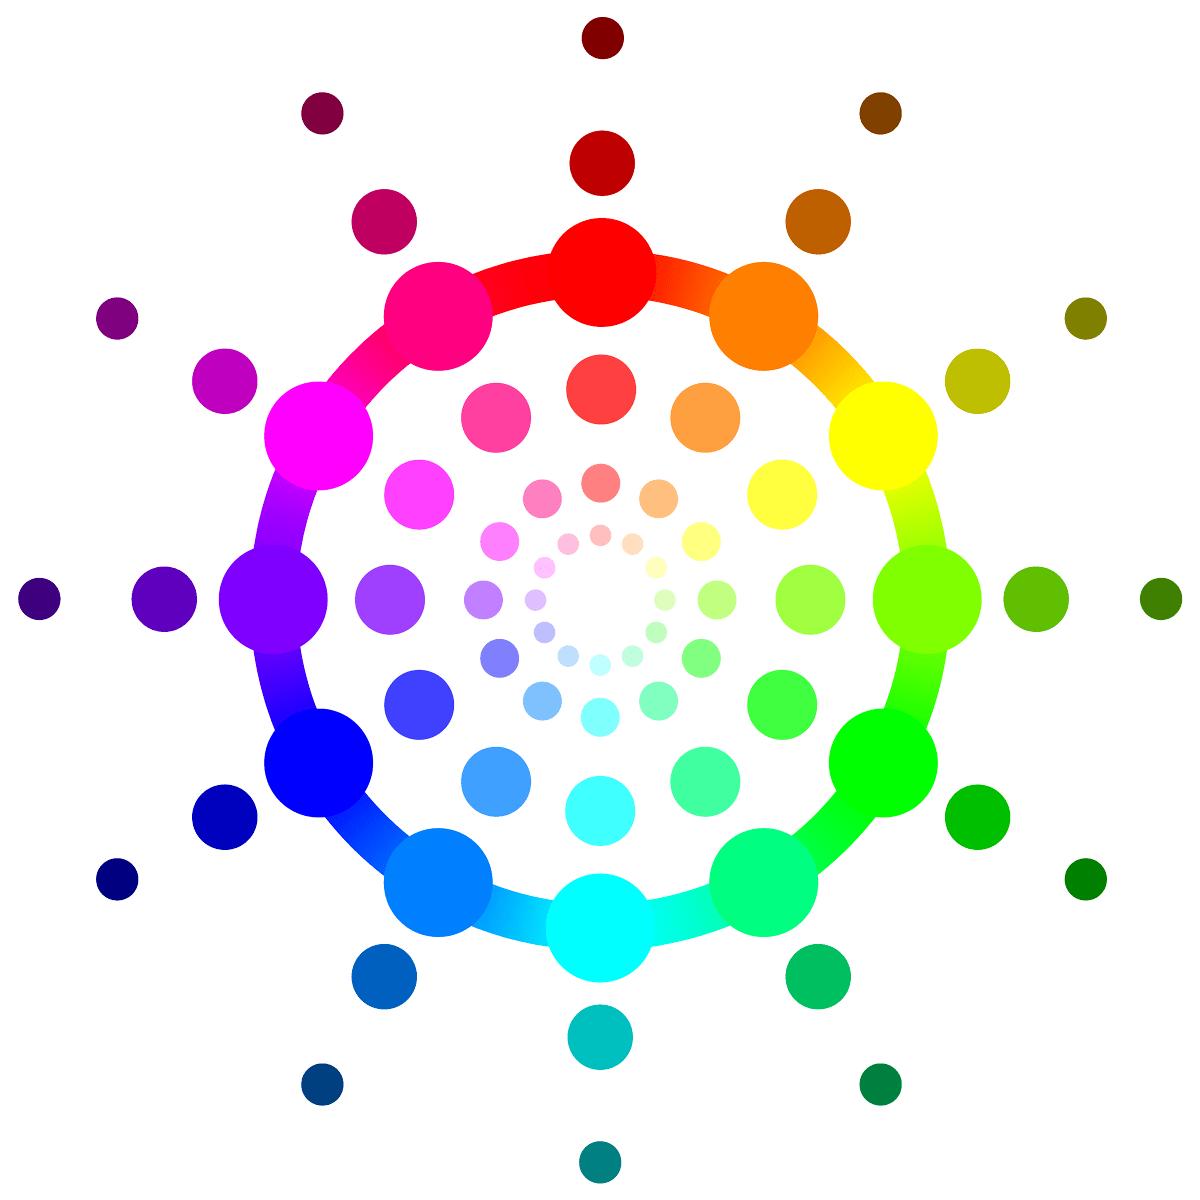 Rgb Color Wheel Hex Values Printable Blank Color Wheel Templates